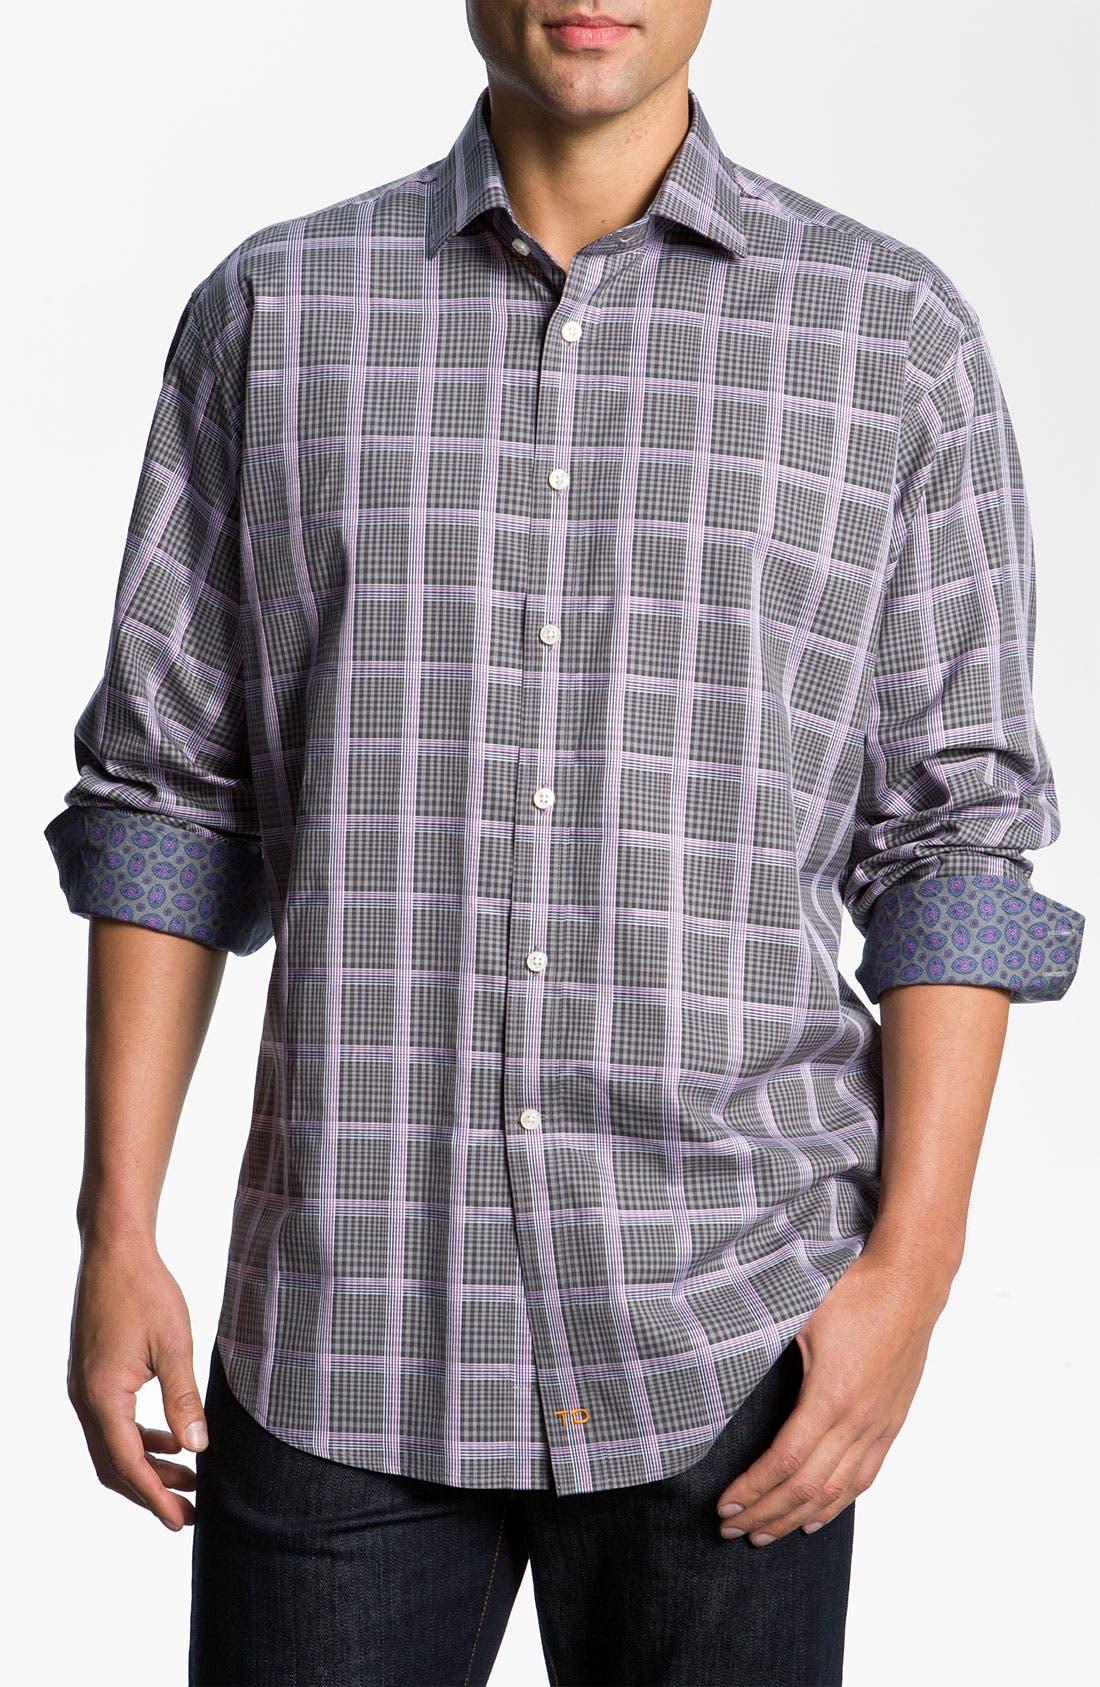 Alternate Image 1 Selected - Thomas Dean Check Sport Shirt